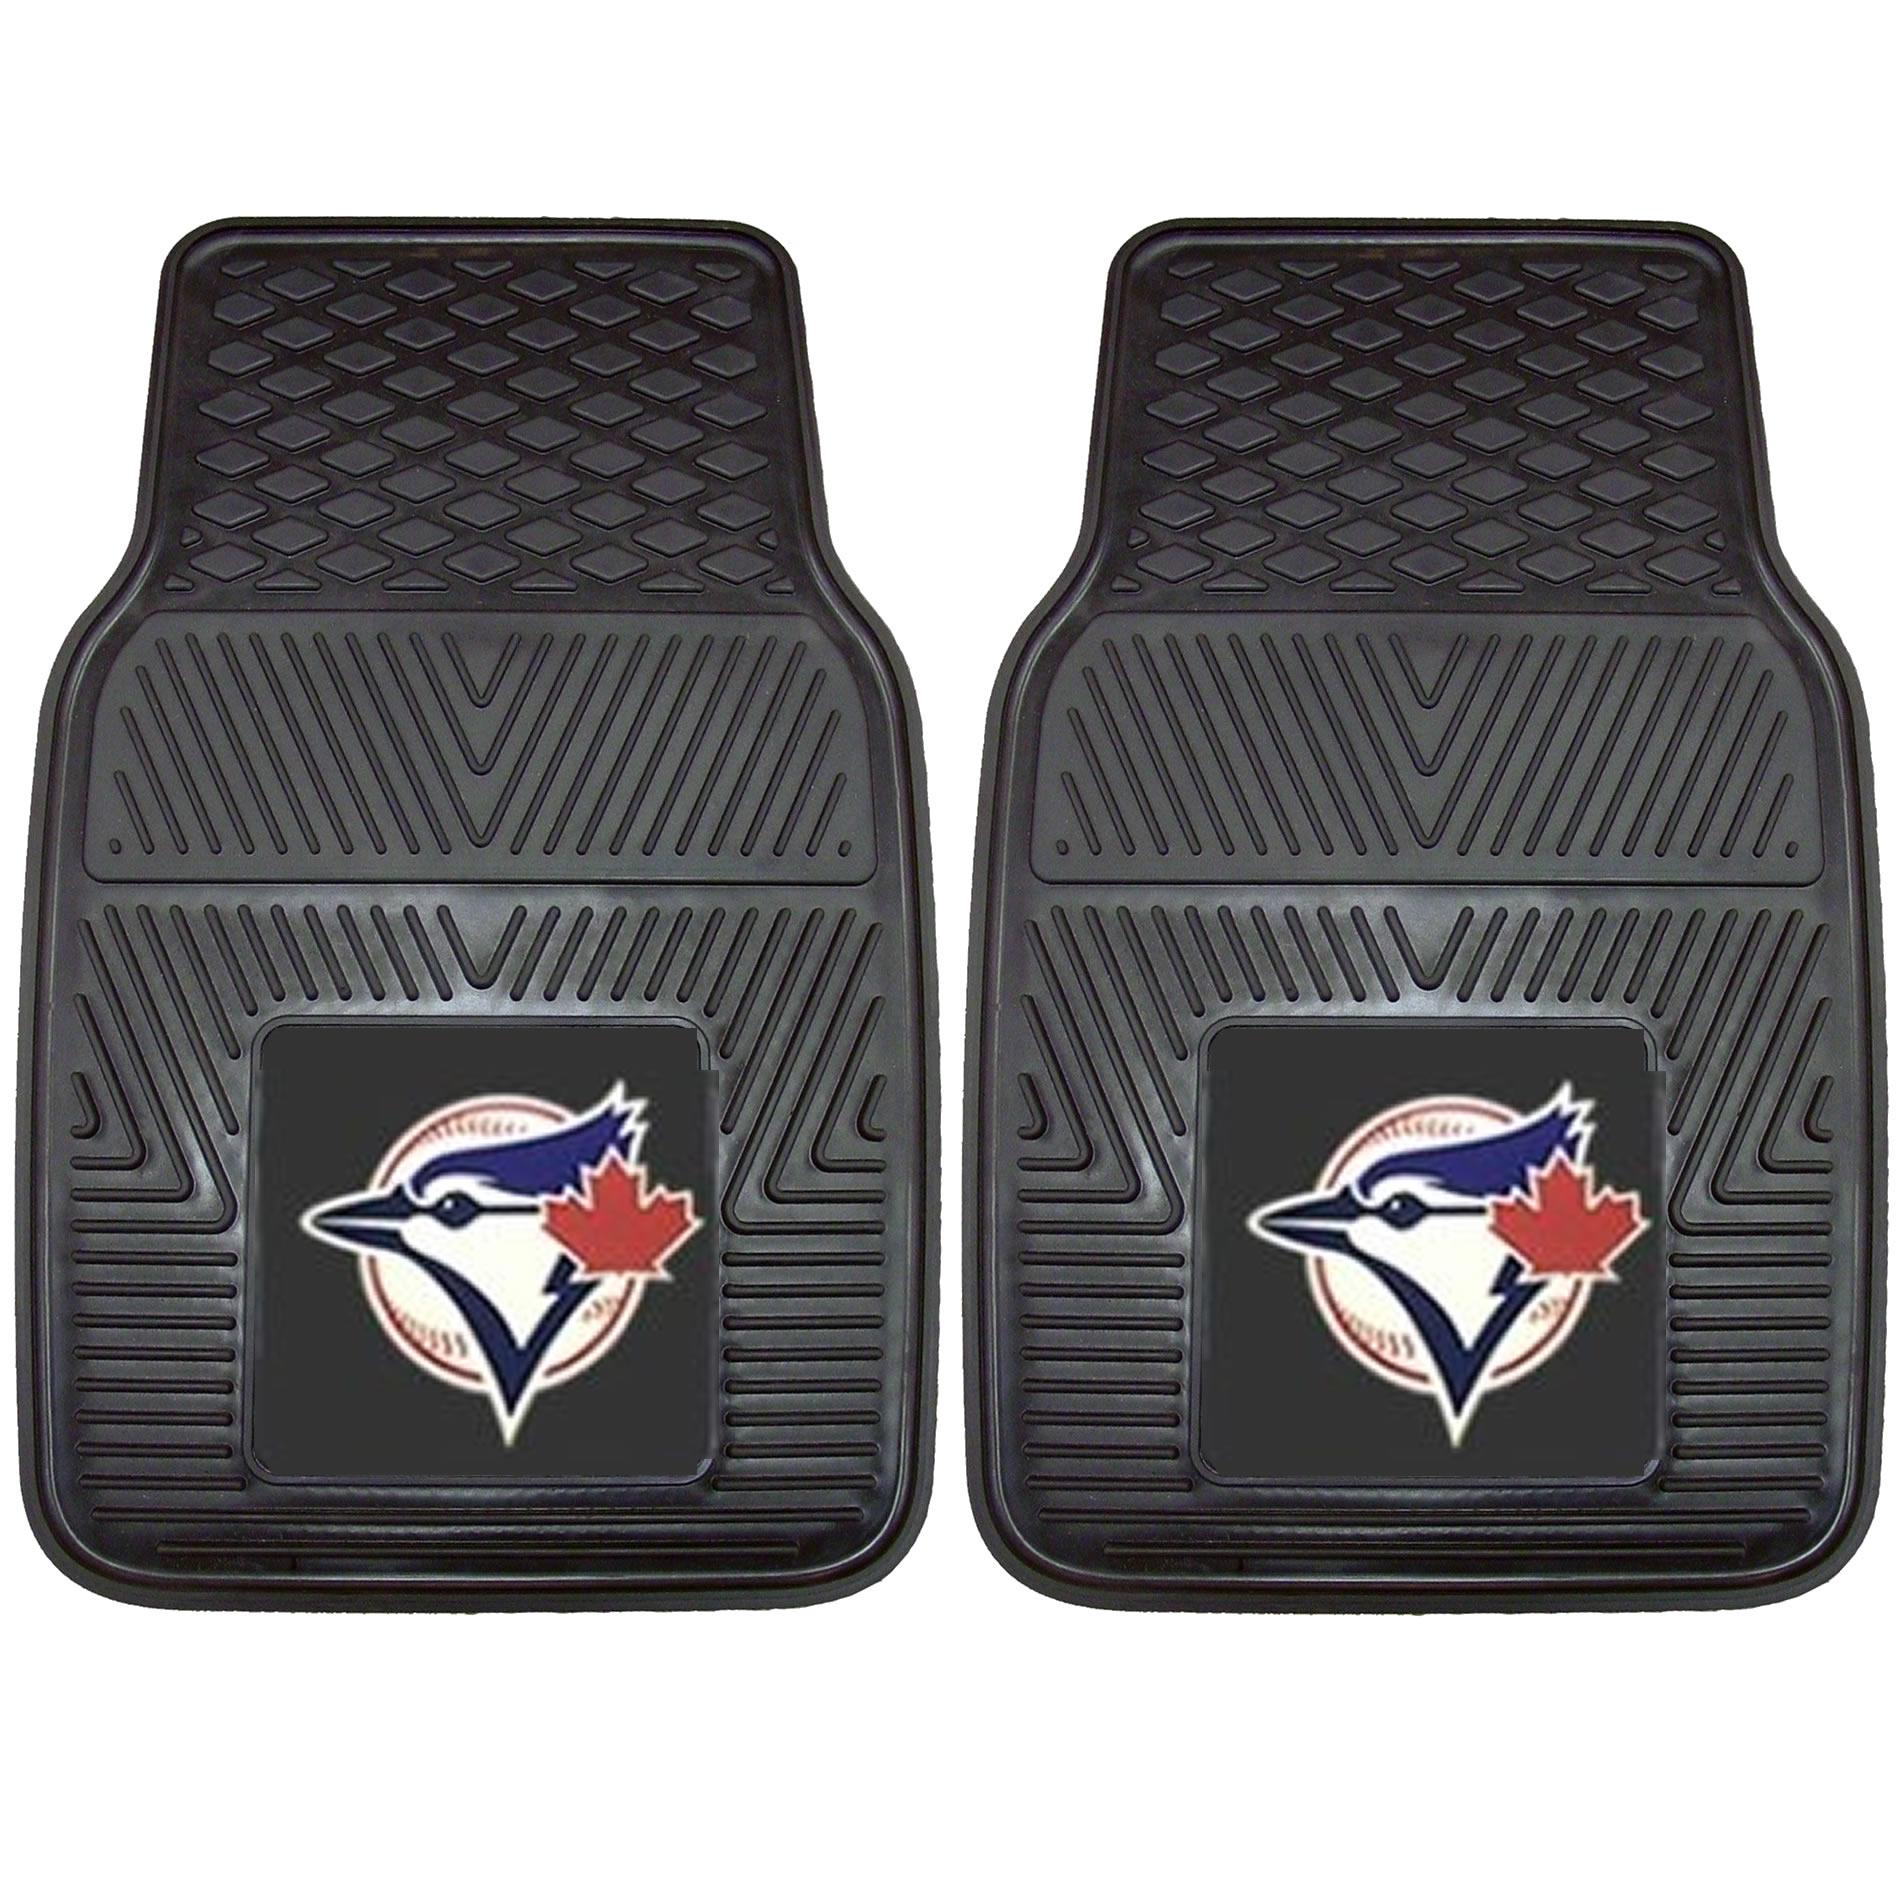 Rubber floor mats toronto - Mlb Toronto Blue Jays 2pc Heavy Duty Rubber Floor Mats Set Car Van Truck